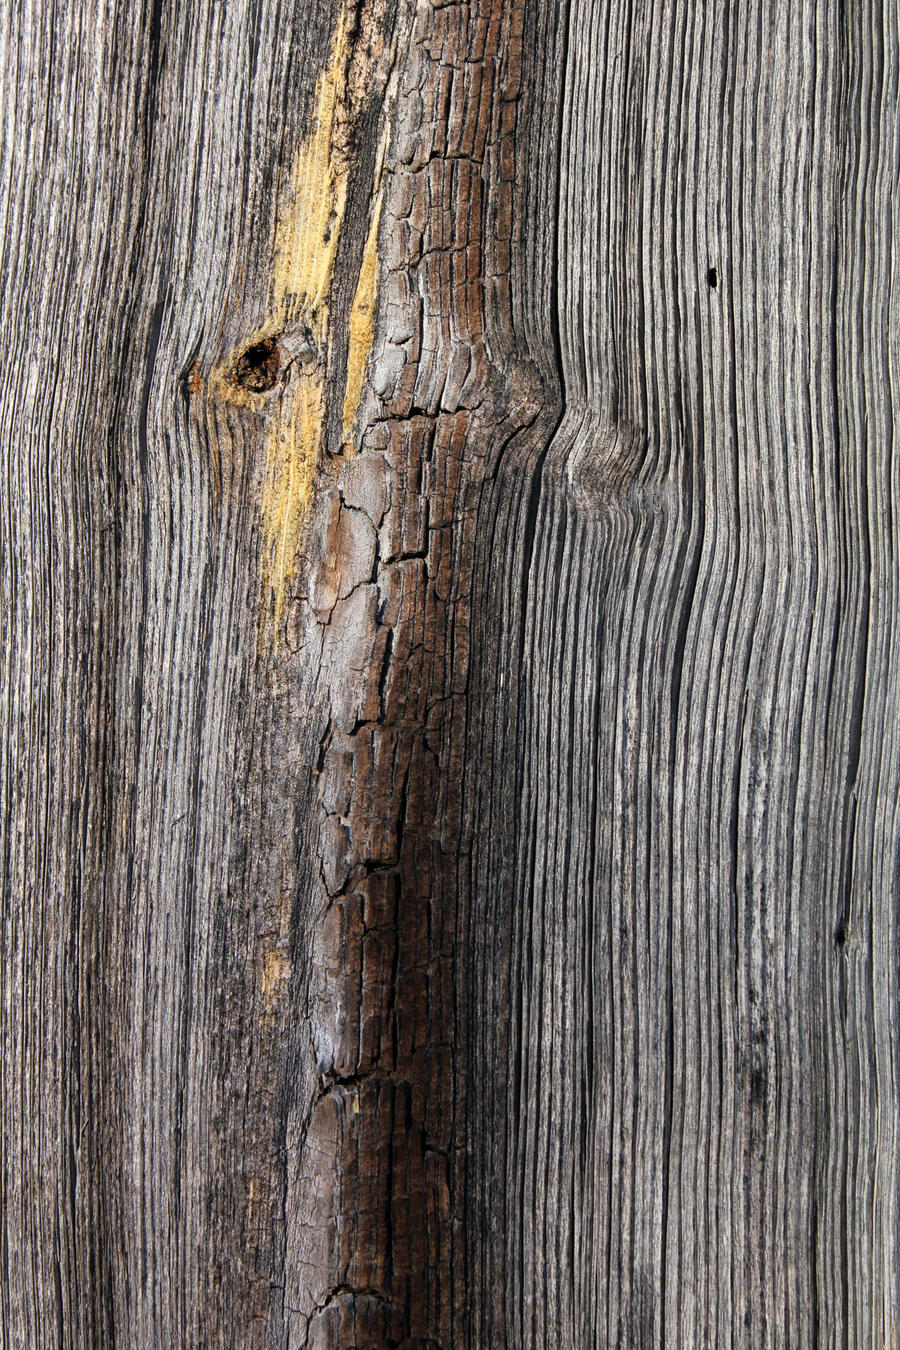 Barn Wood Texture barn wood texture 02thy-darkest-hour on deviantart